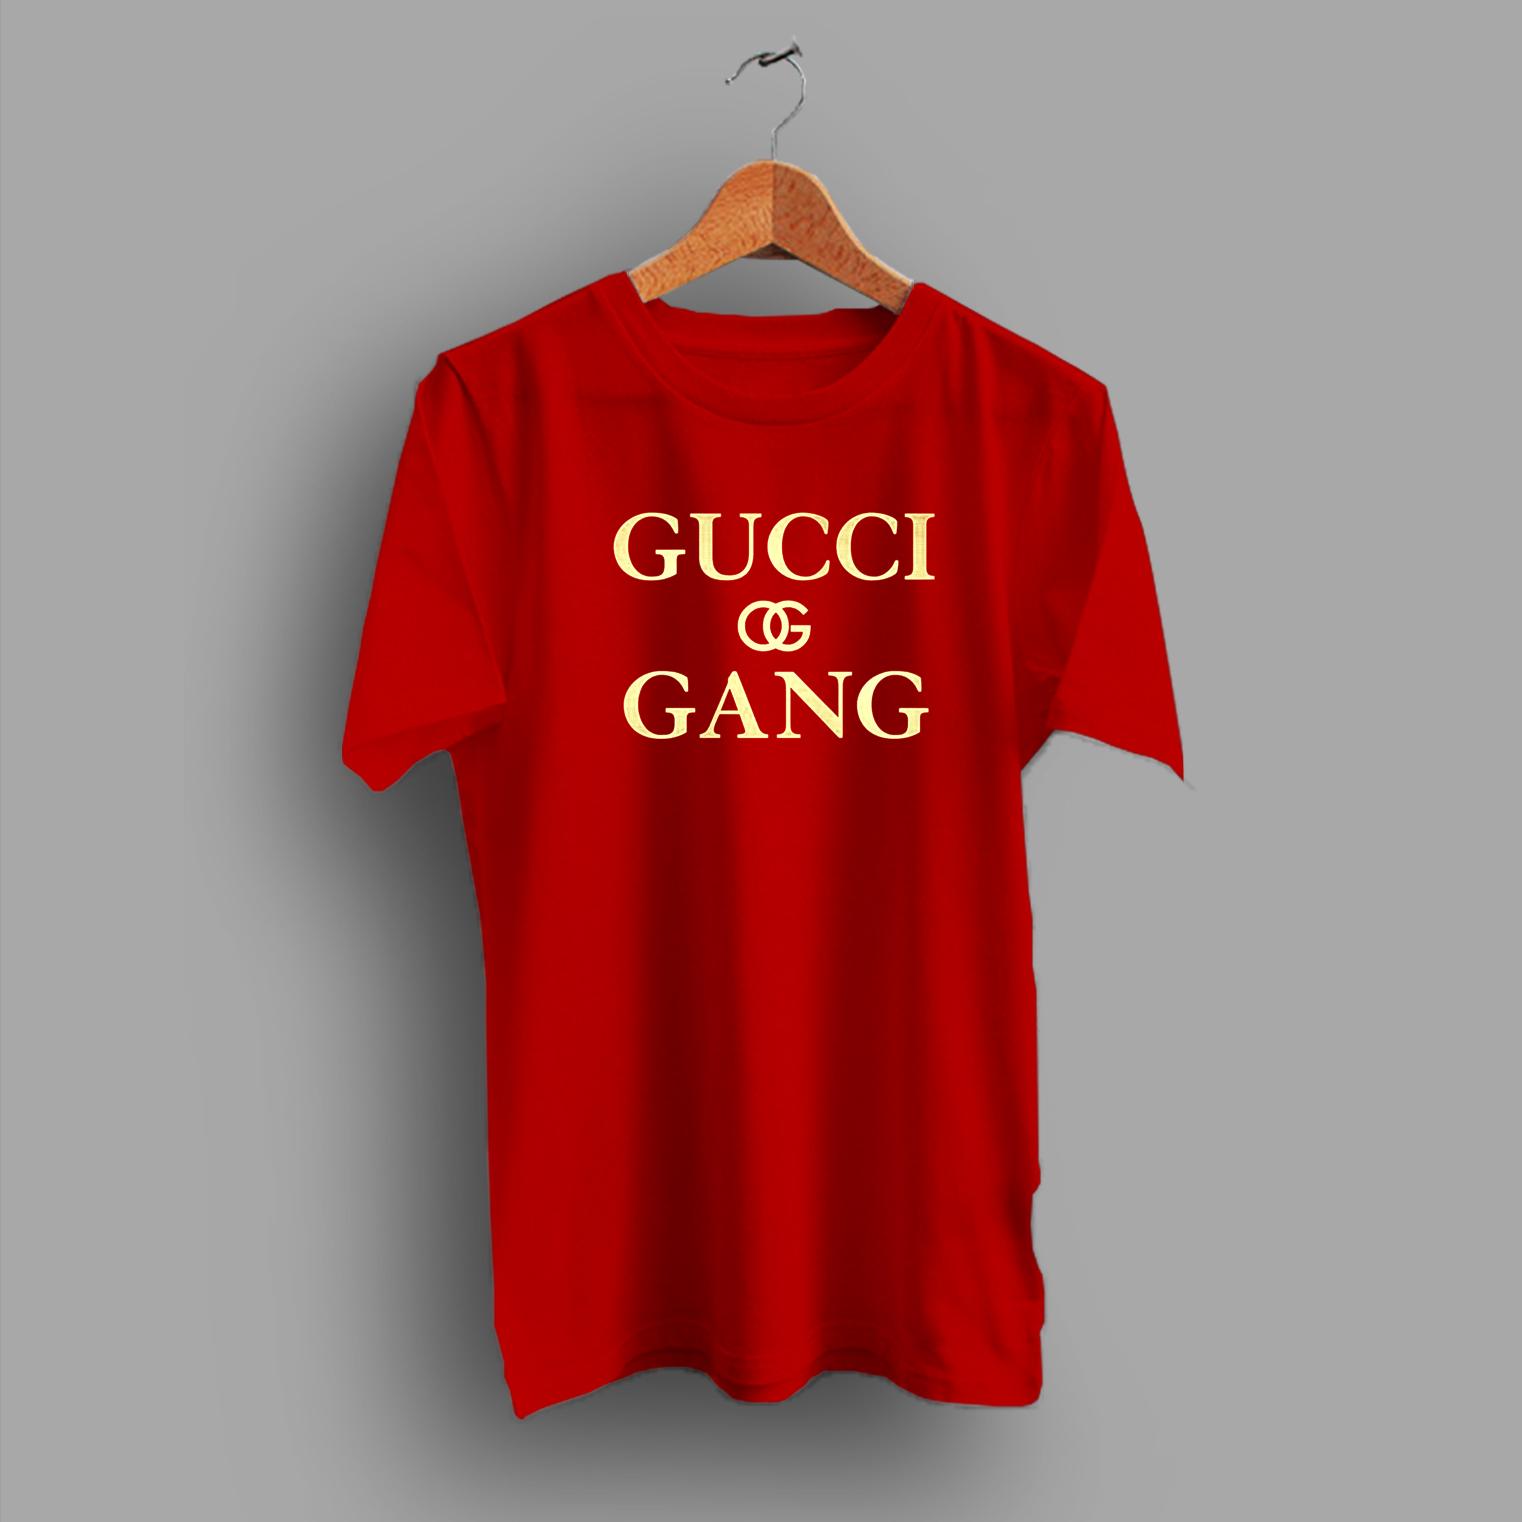 8310cee87 Lil Pump Gucci Gang Hip Hop T Shirt Urban Fashion - Hotvero